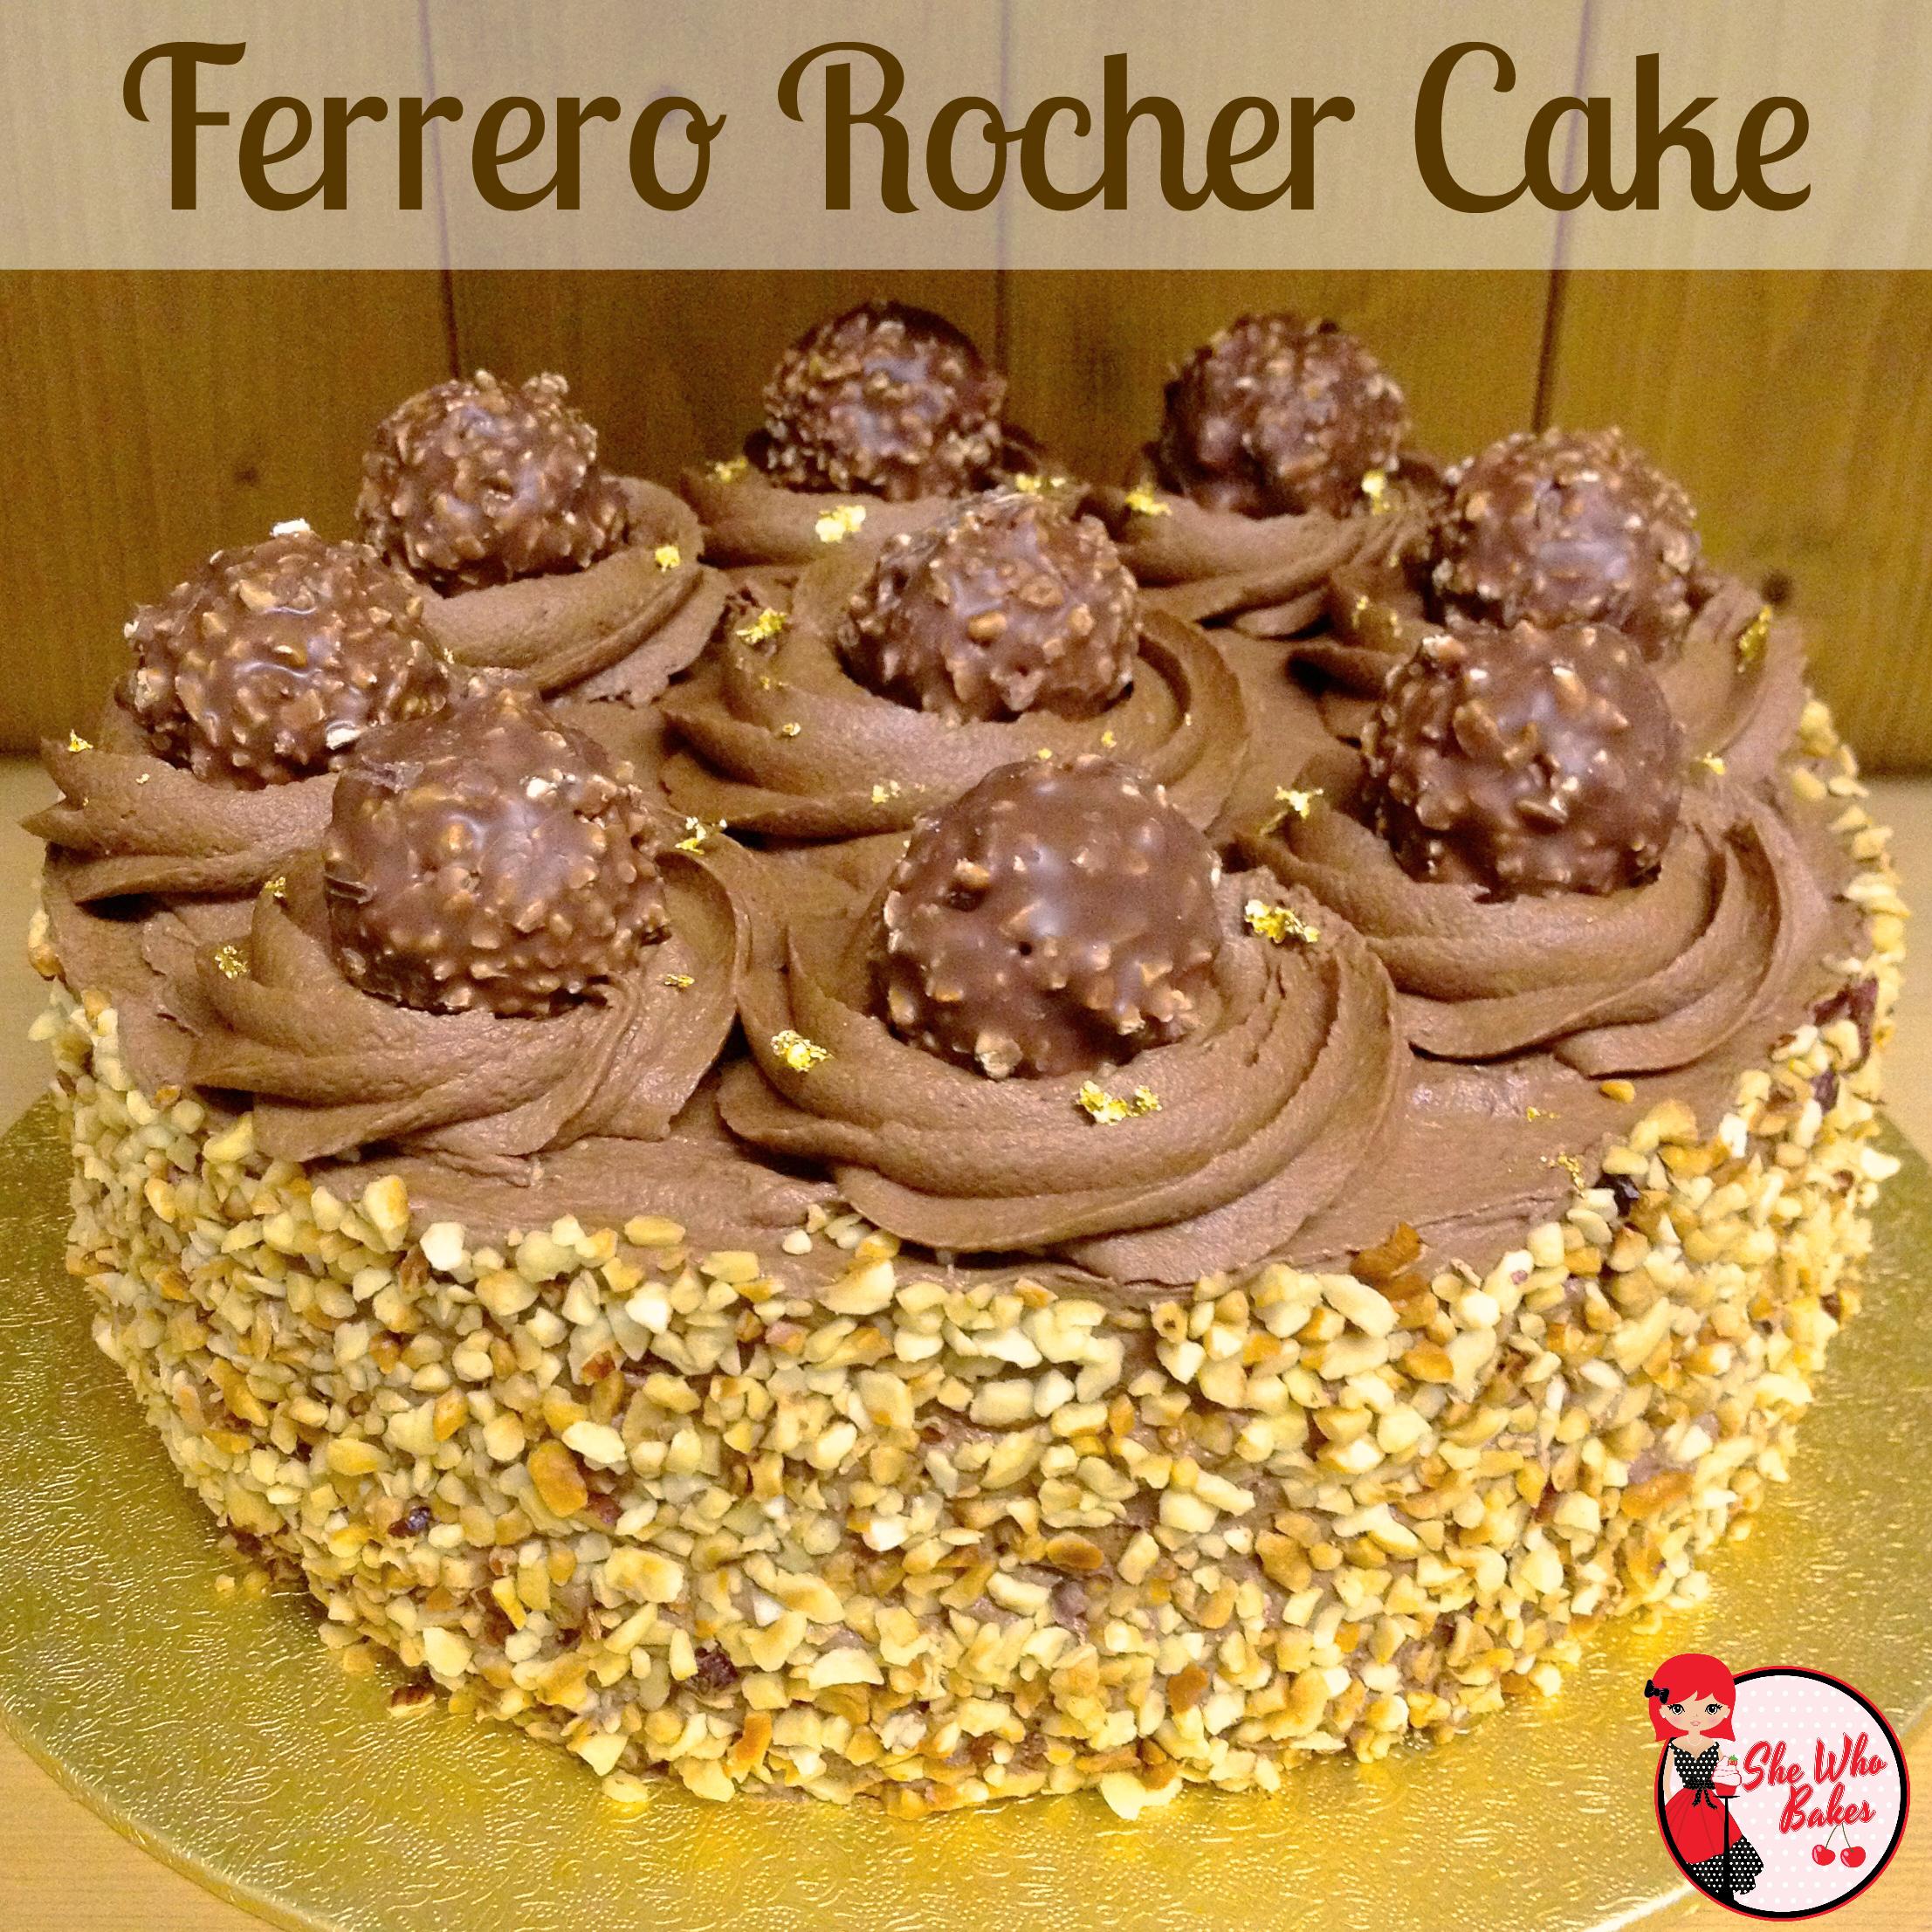 036c02802b60 Ferrero Rocher Cake - She Who Bakes